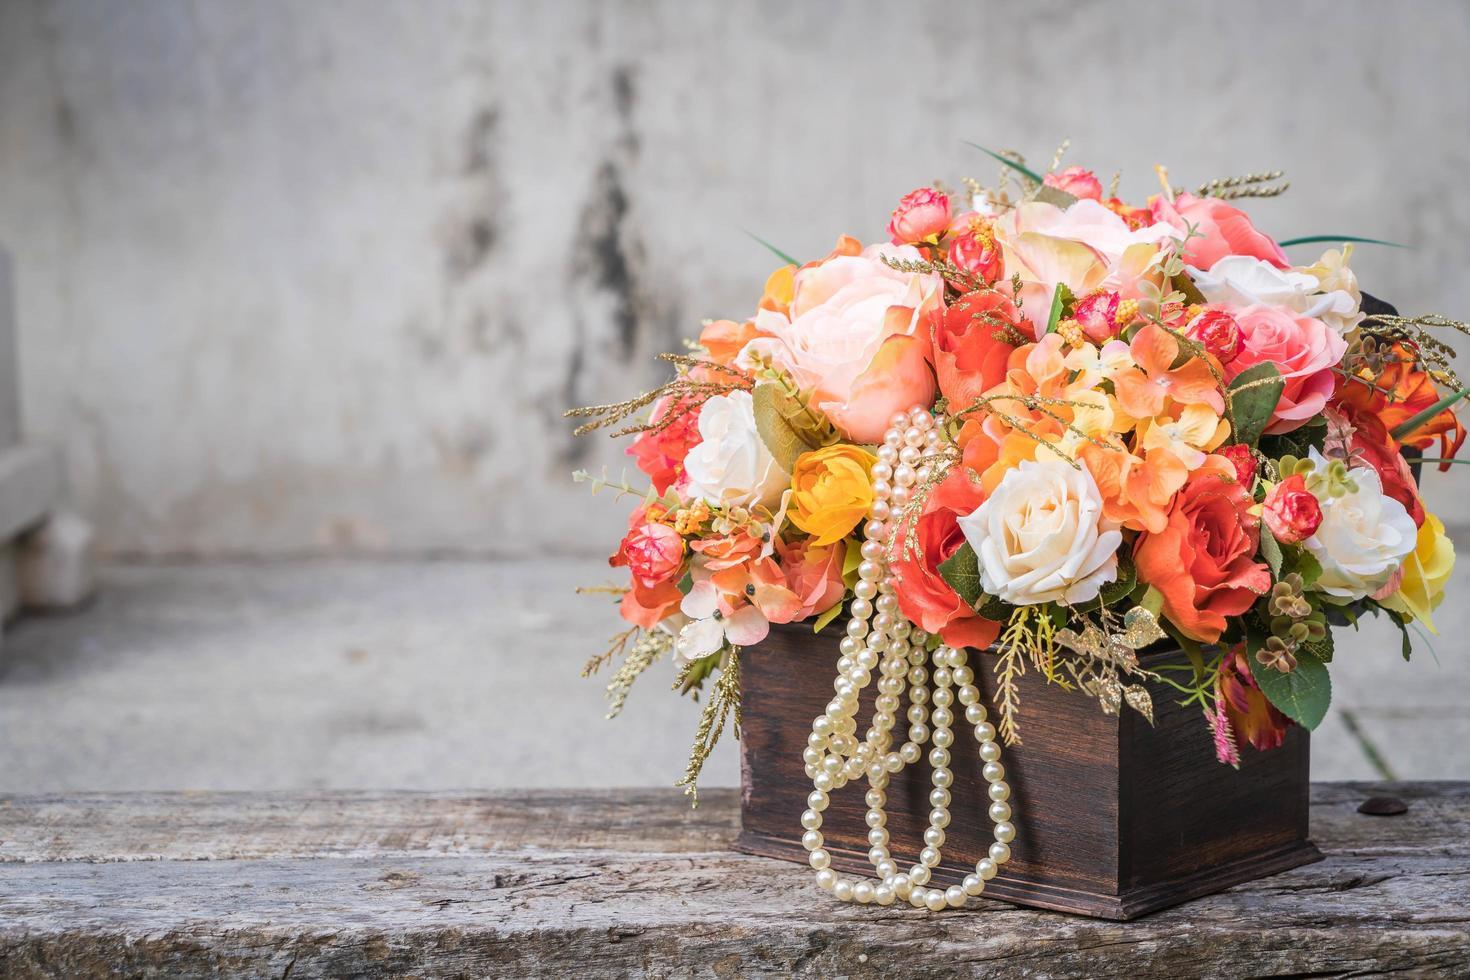 Flower bouquet in wooden box  photo